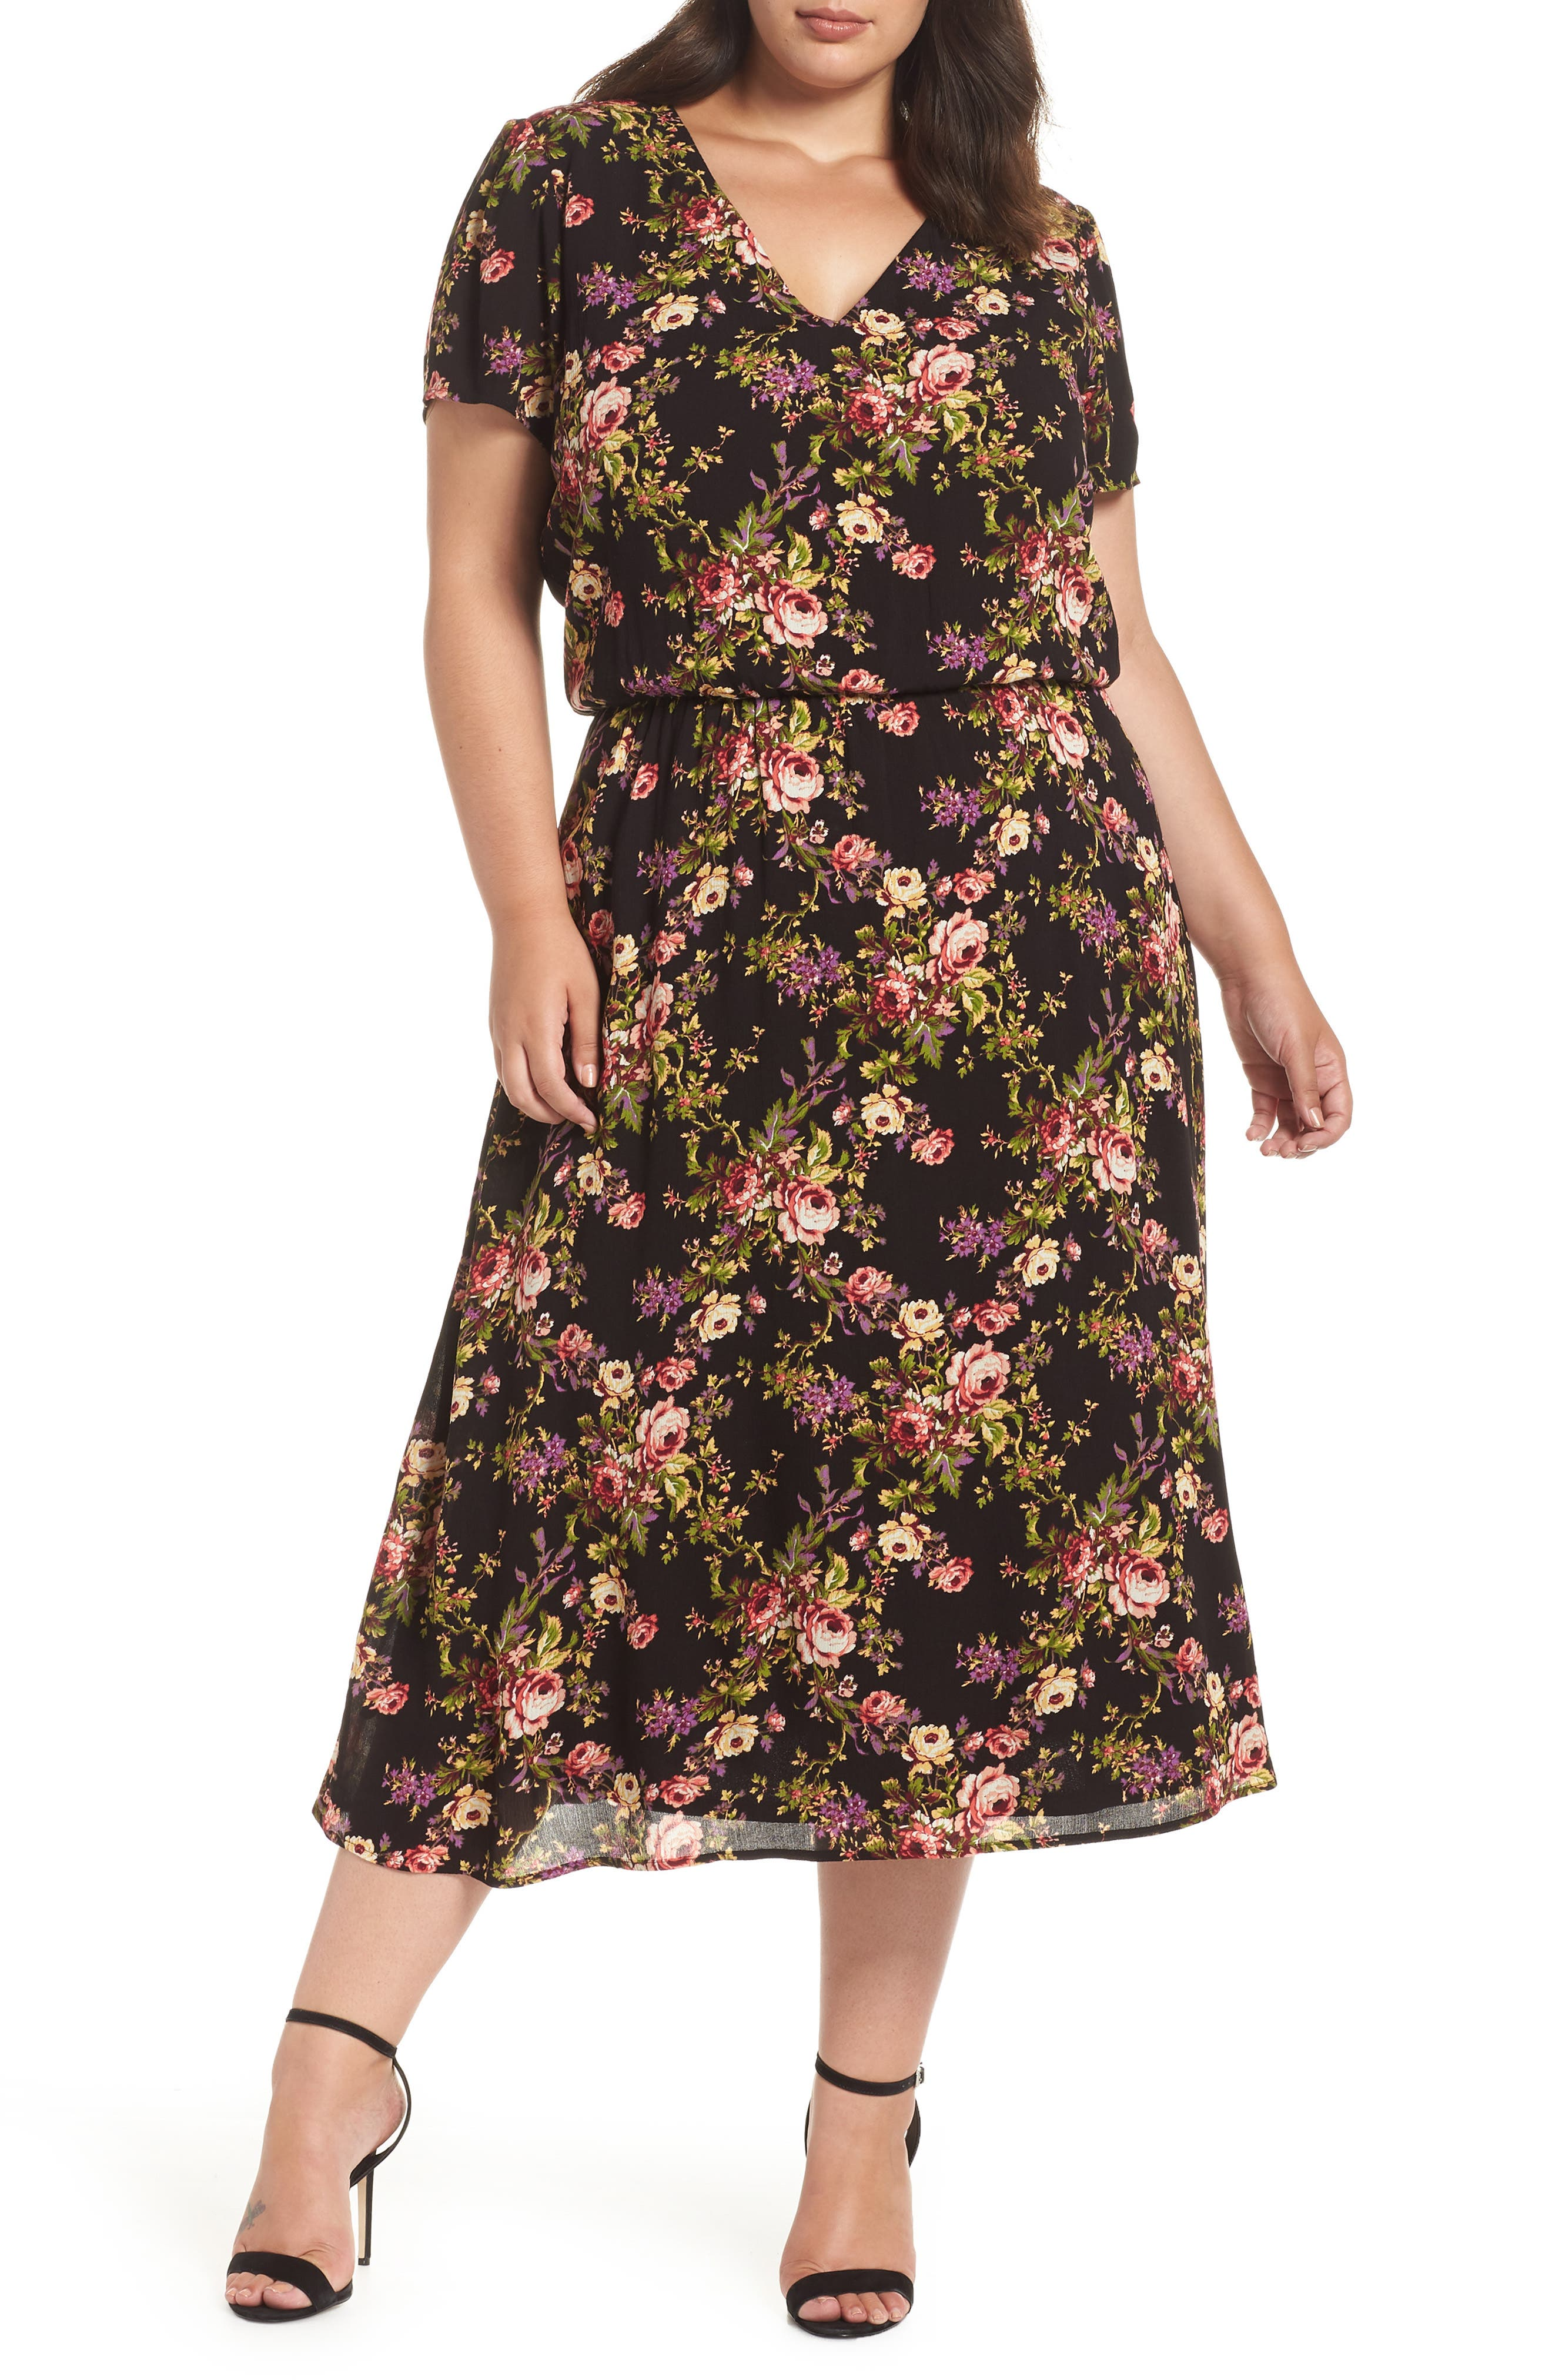 Blouson Midi Dress,                         Main,                         color, BLACK TAPESTRY FLORAL